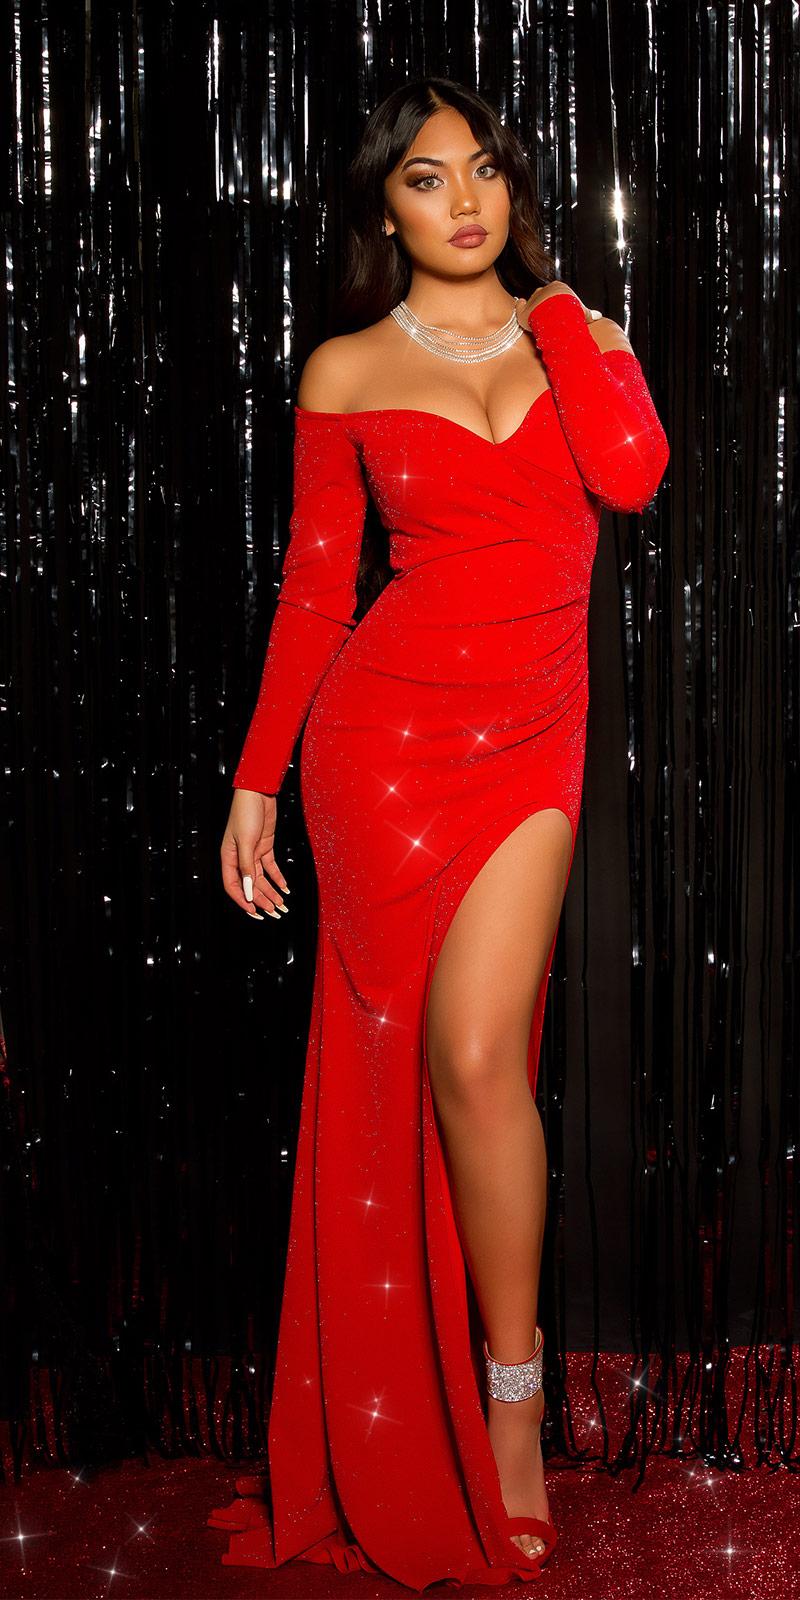 Rochii de seara sexy model elegant Look cu sclipici evening